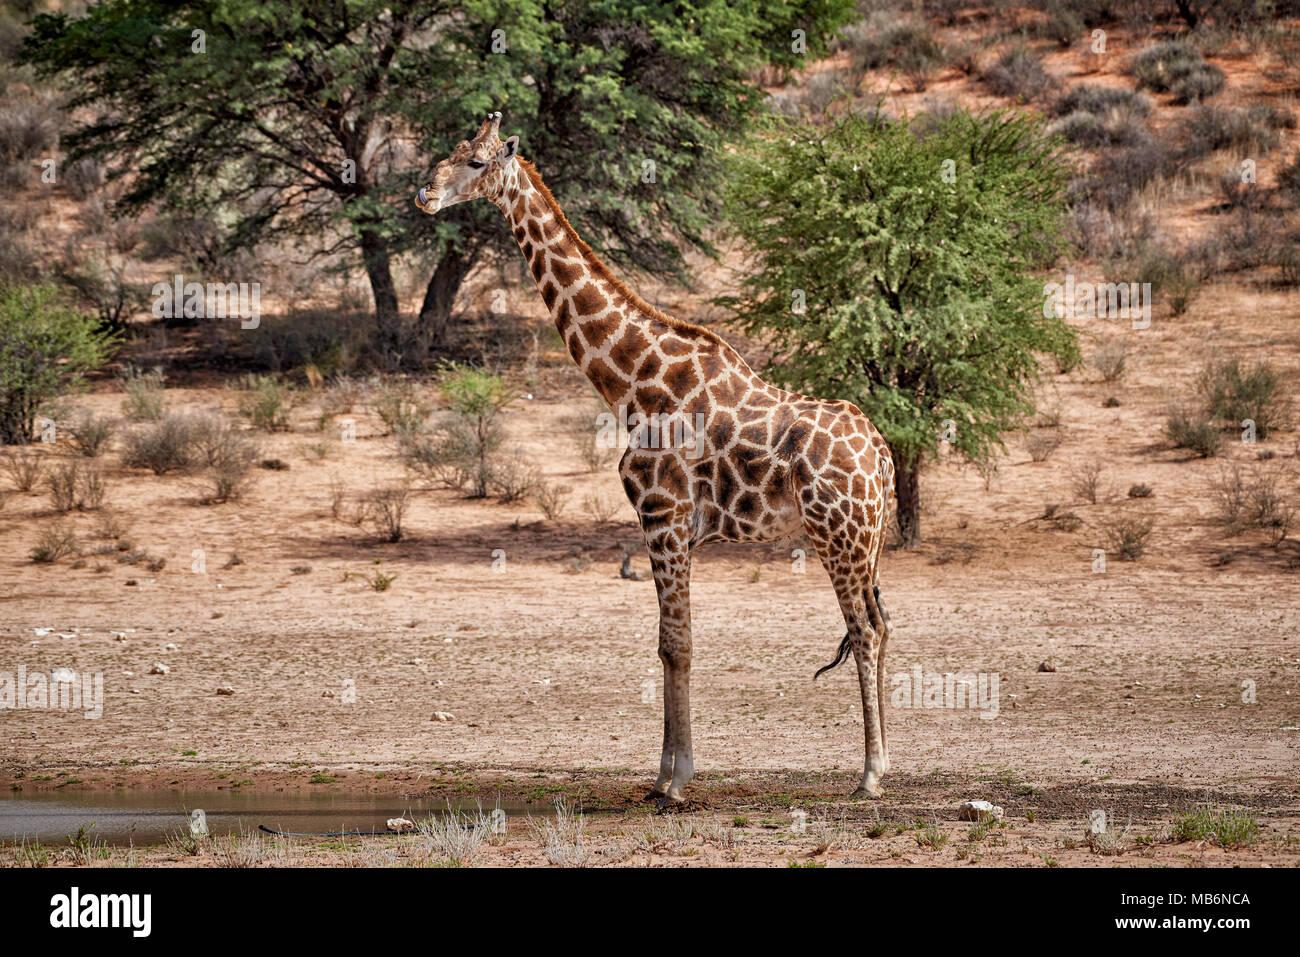 giraffe [Giraffa camelopardalis] in Kgalagadi Transfrontier Park, South Africa, Africa - Stock Image